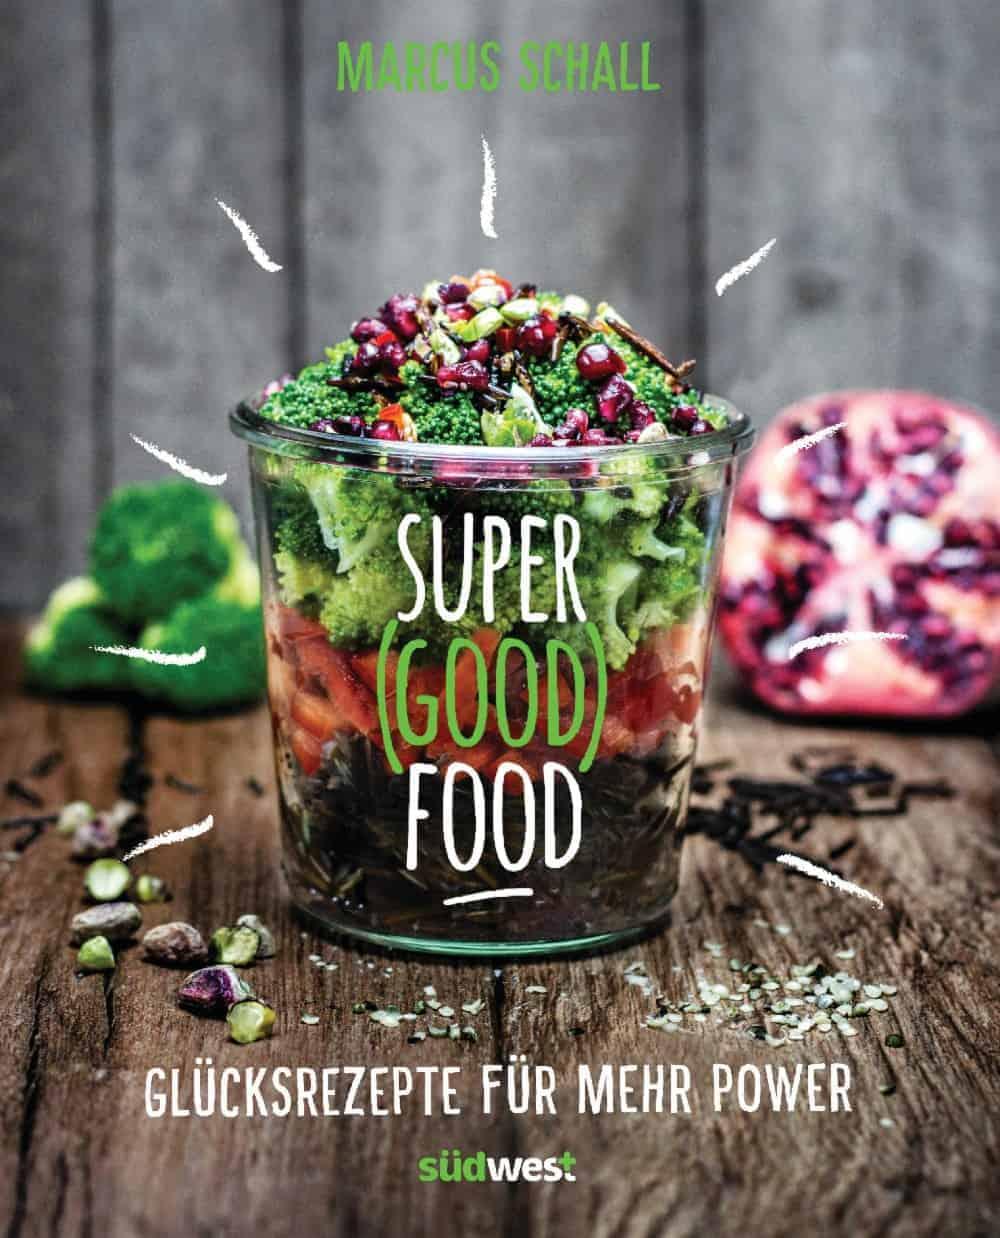 Supergoodfood Buch